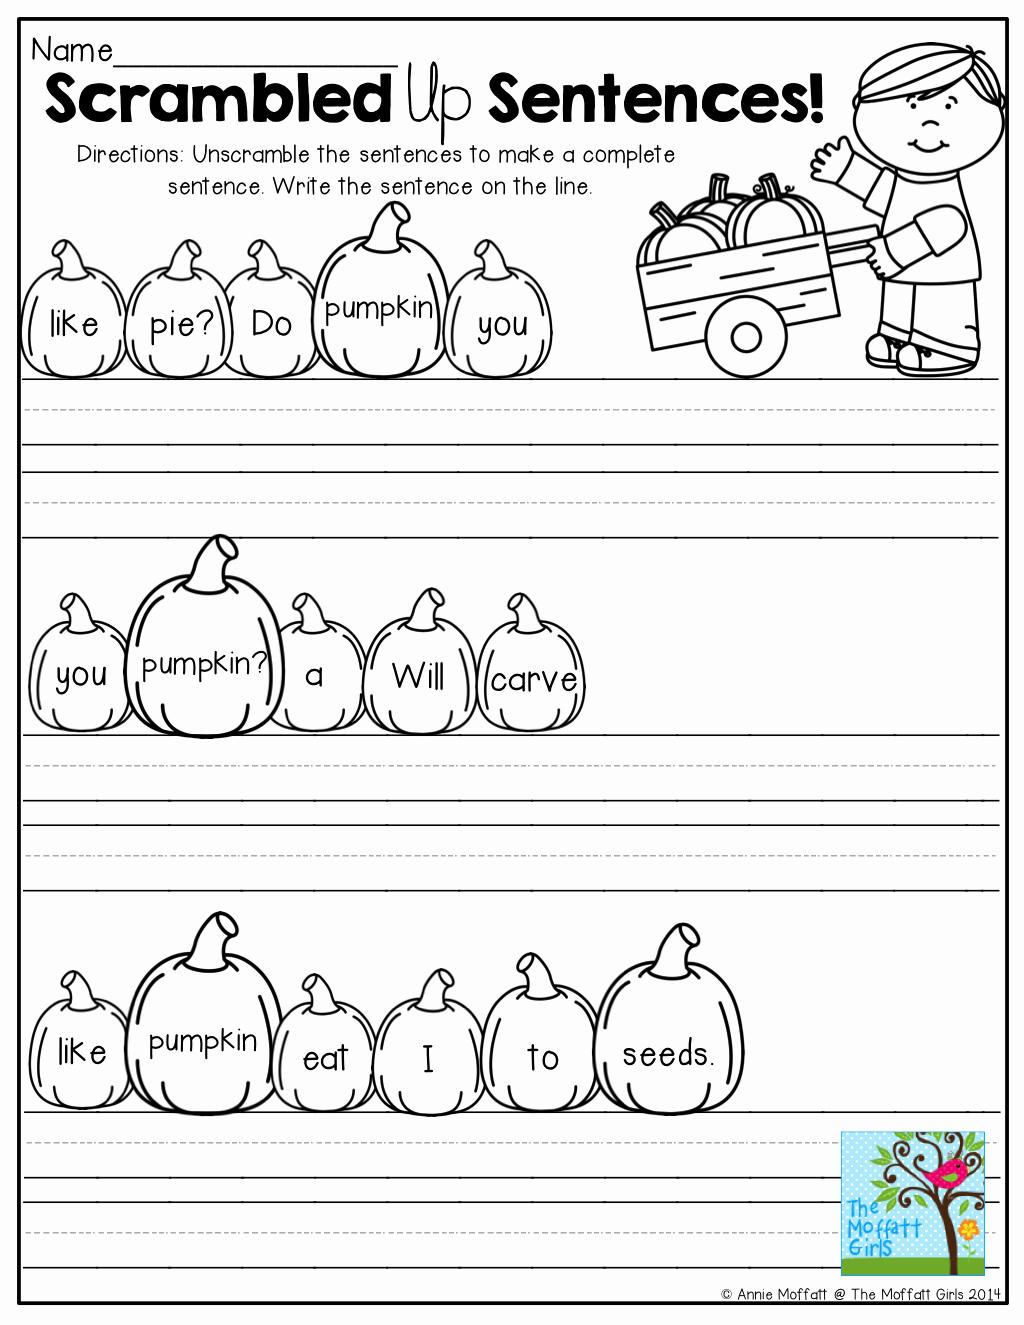 Scrambled Sentences Worksheets 2nd Grade Elegant 100 Unscramble Sentences Worksheet Scrambled Up